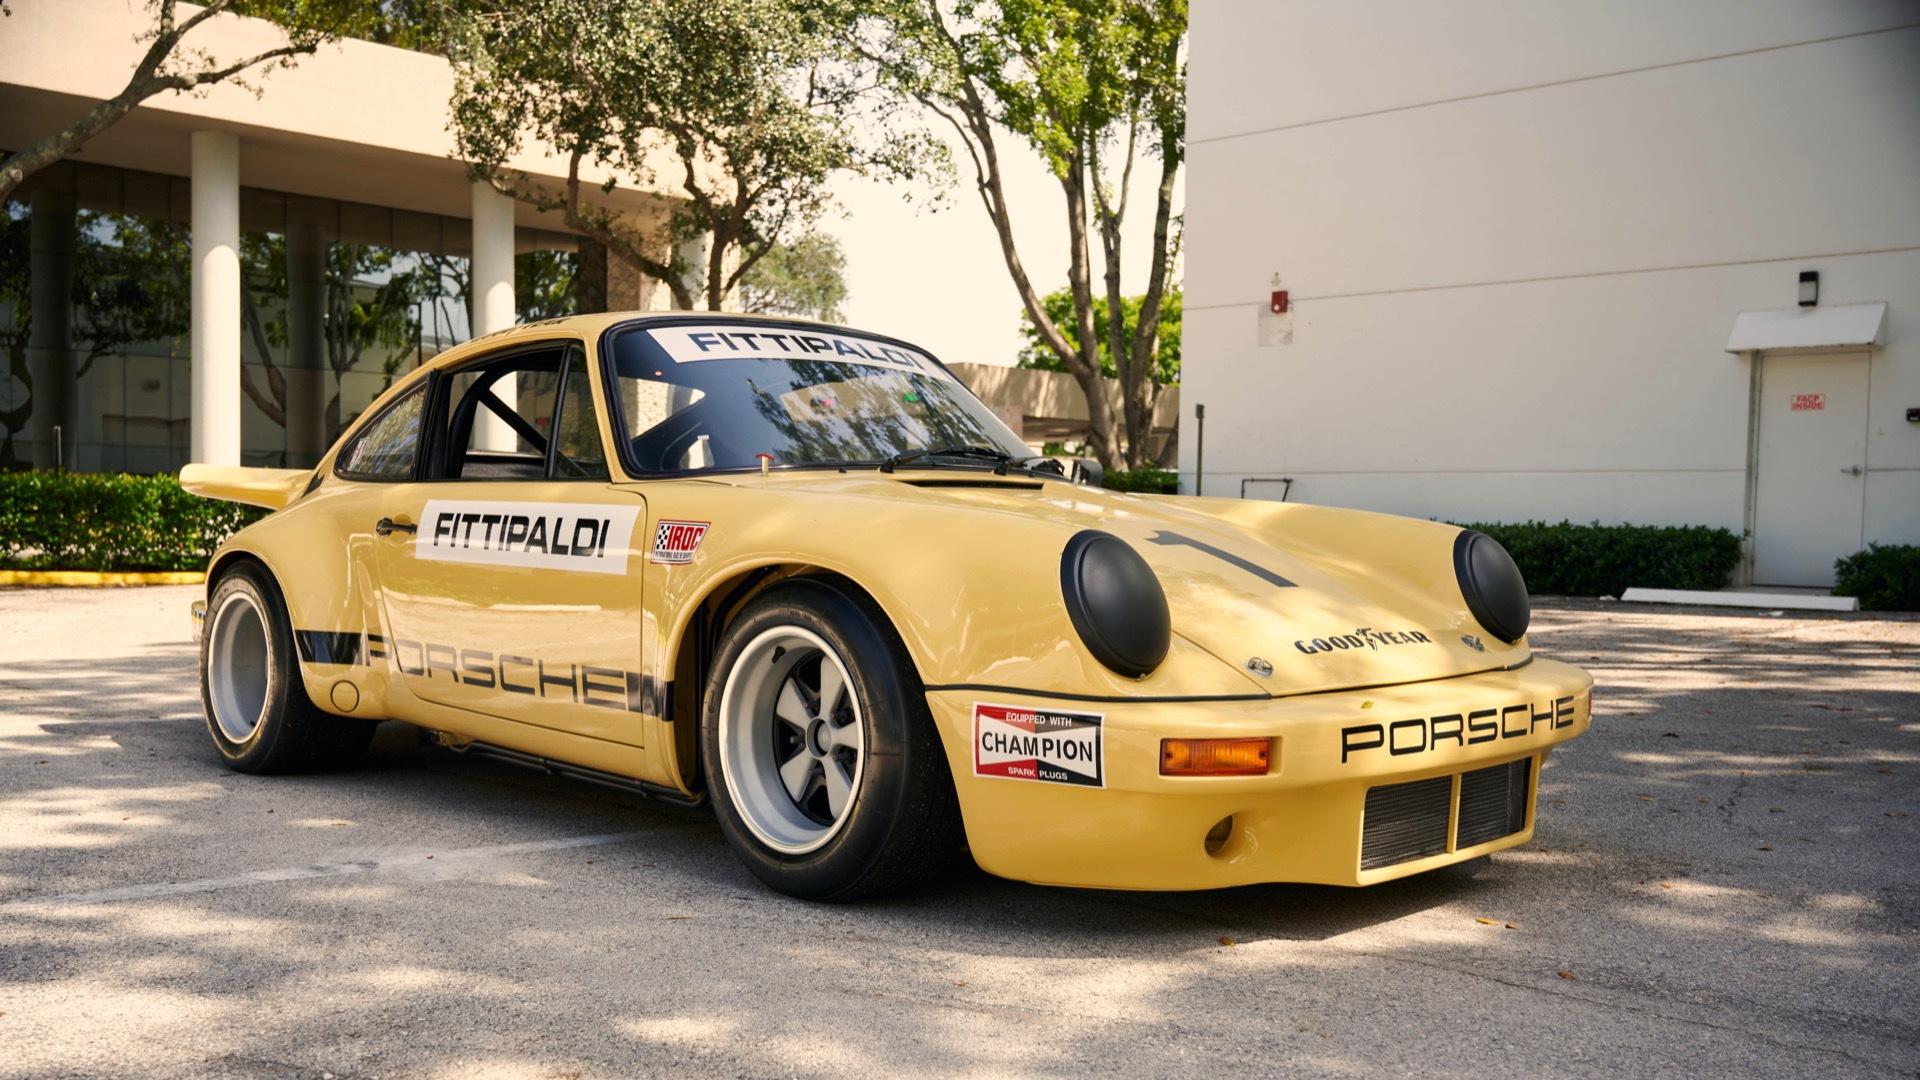 1974 Porsche 911 Carrera 3.0 IROC RSR (photo via Collecting Cars)